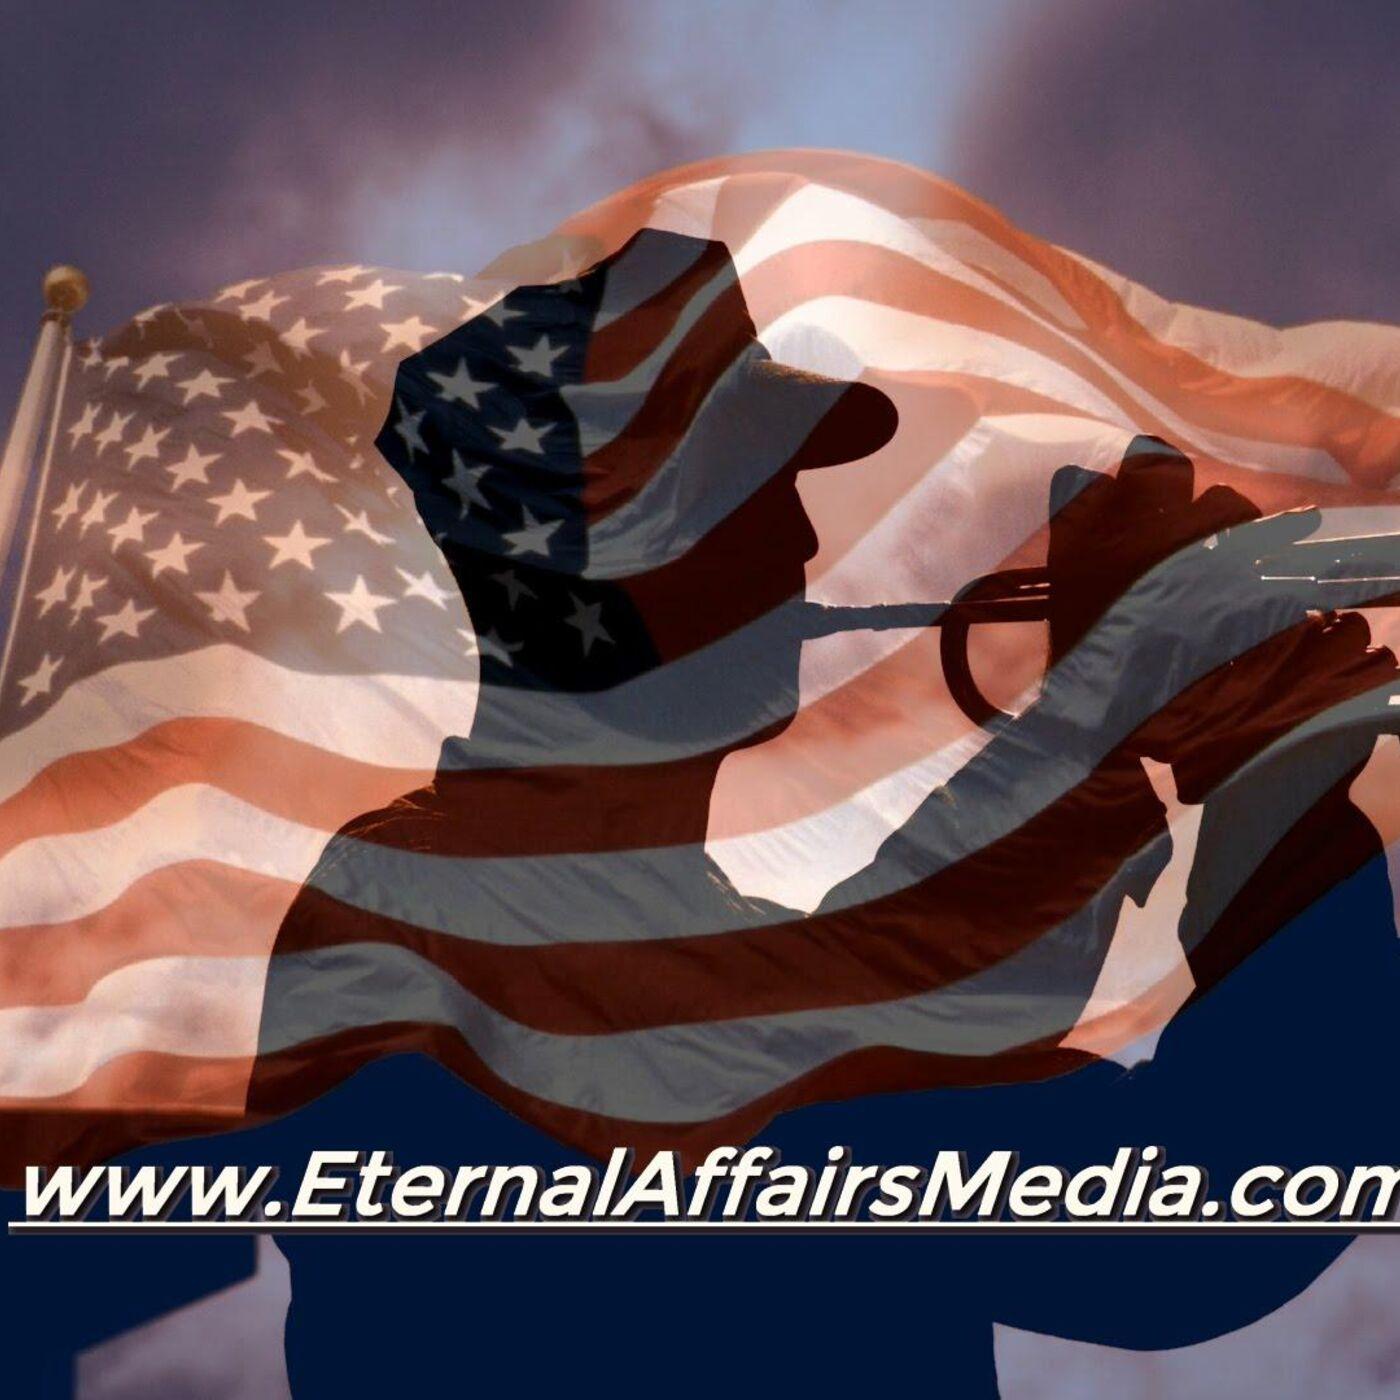 How Our Election Process Has Failed Us ~ POLITICALLY INCORRECT on #EATruthRadio w/ Andy Shecktor  - burst 02